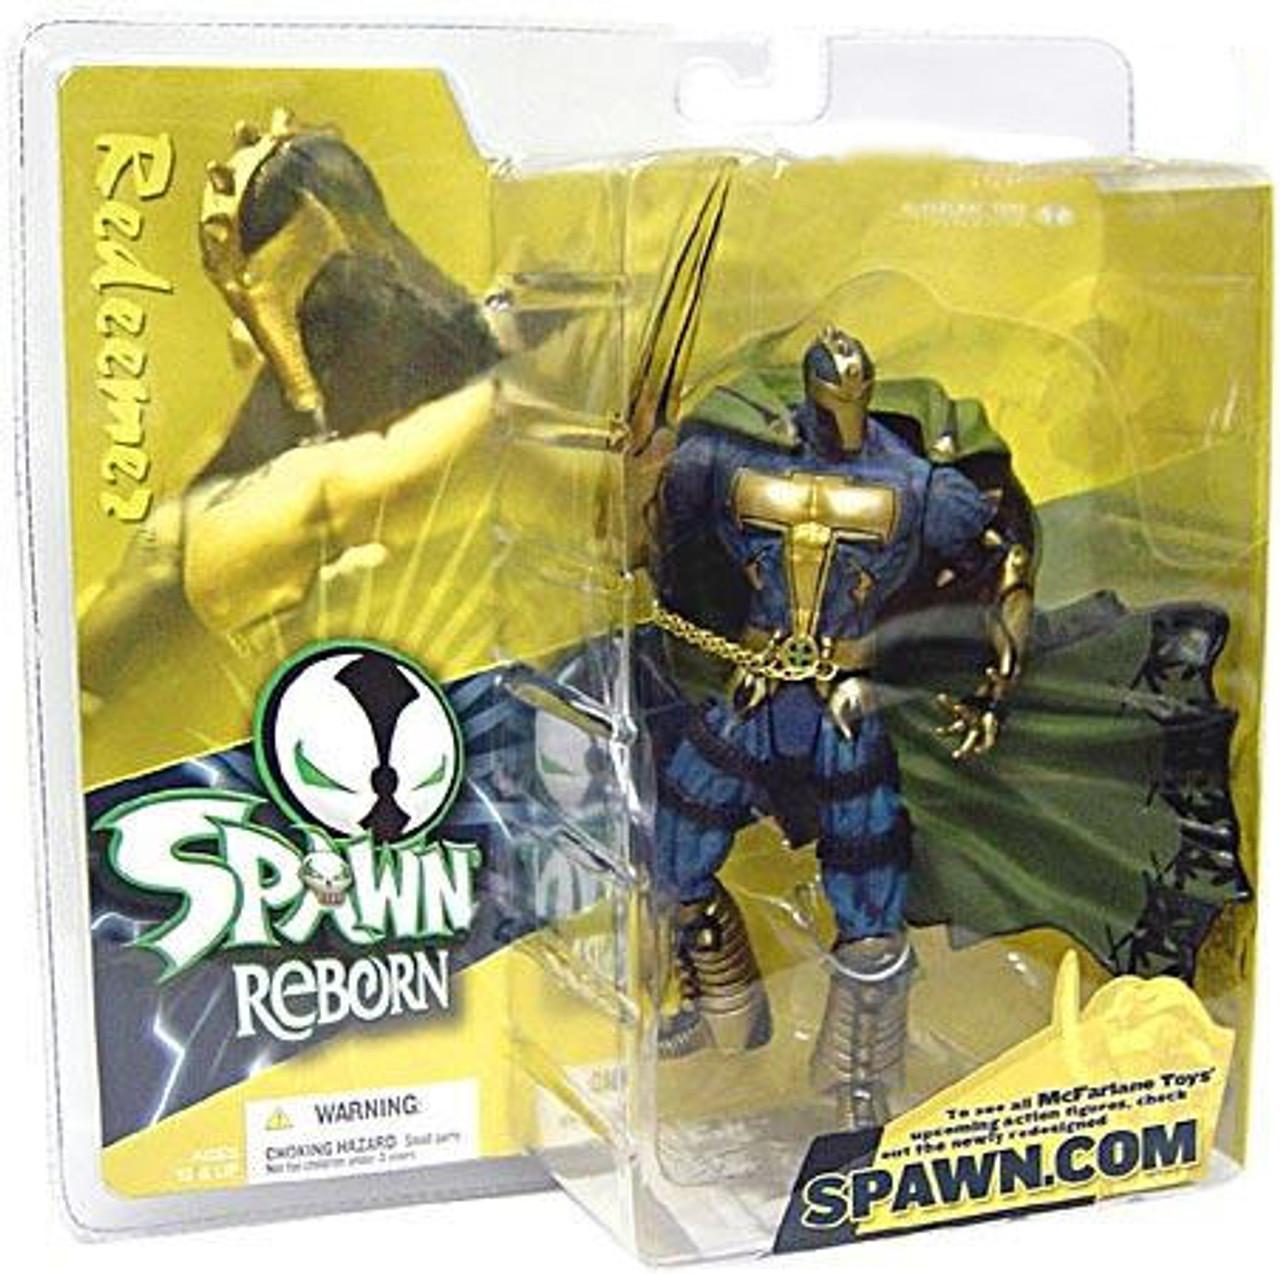 McFarlane Toys Spawn Reborn Series 1 Redeemer Action Figure